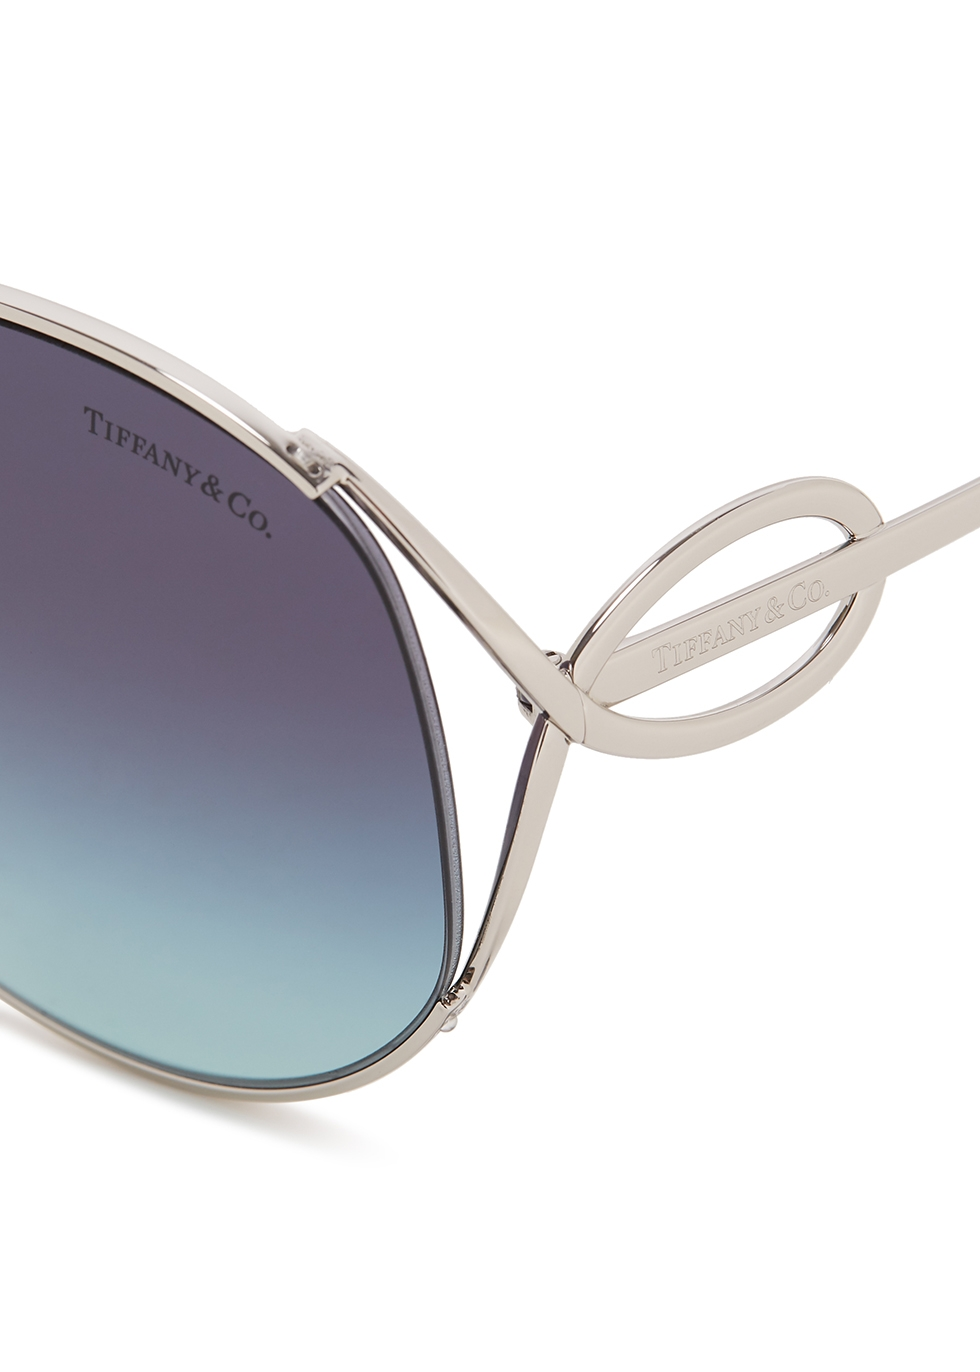 Silver-tone oversized sunglasses - TIFFANY